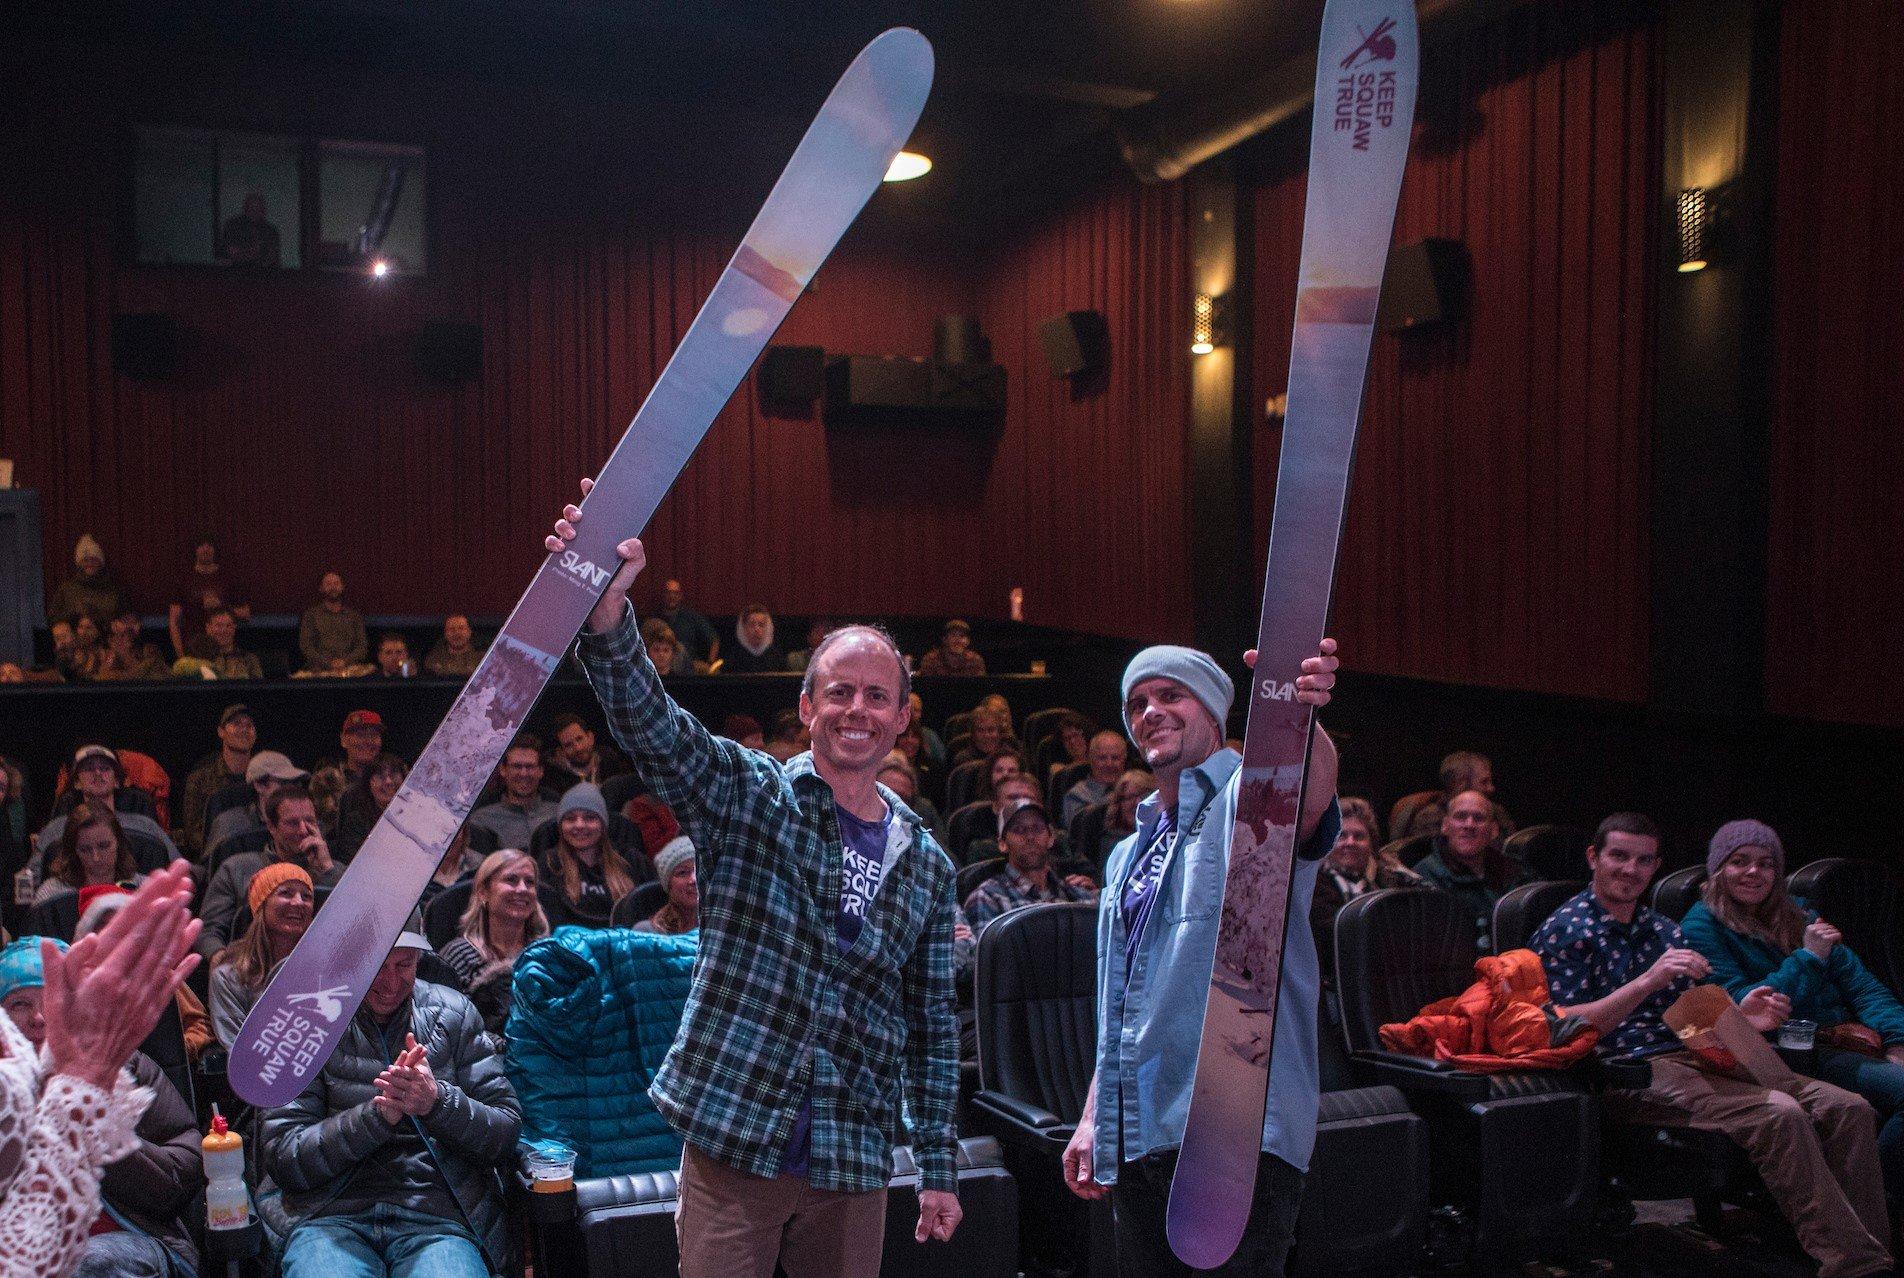 Robb Gaffney, Scott Gaffney, Matchstick Productions, Squaw Valley